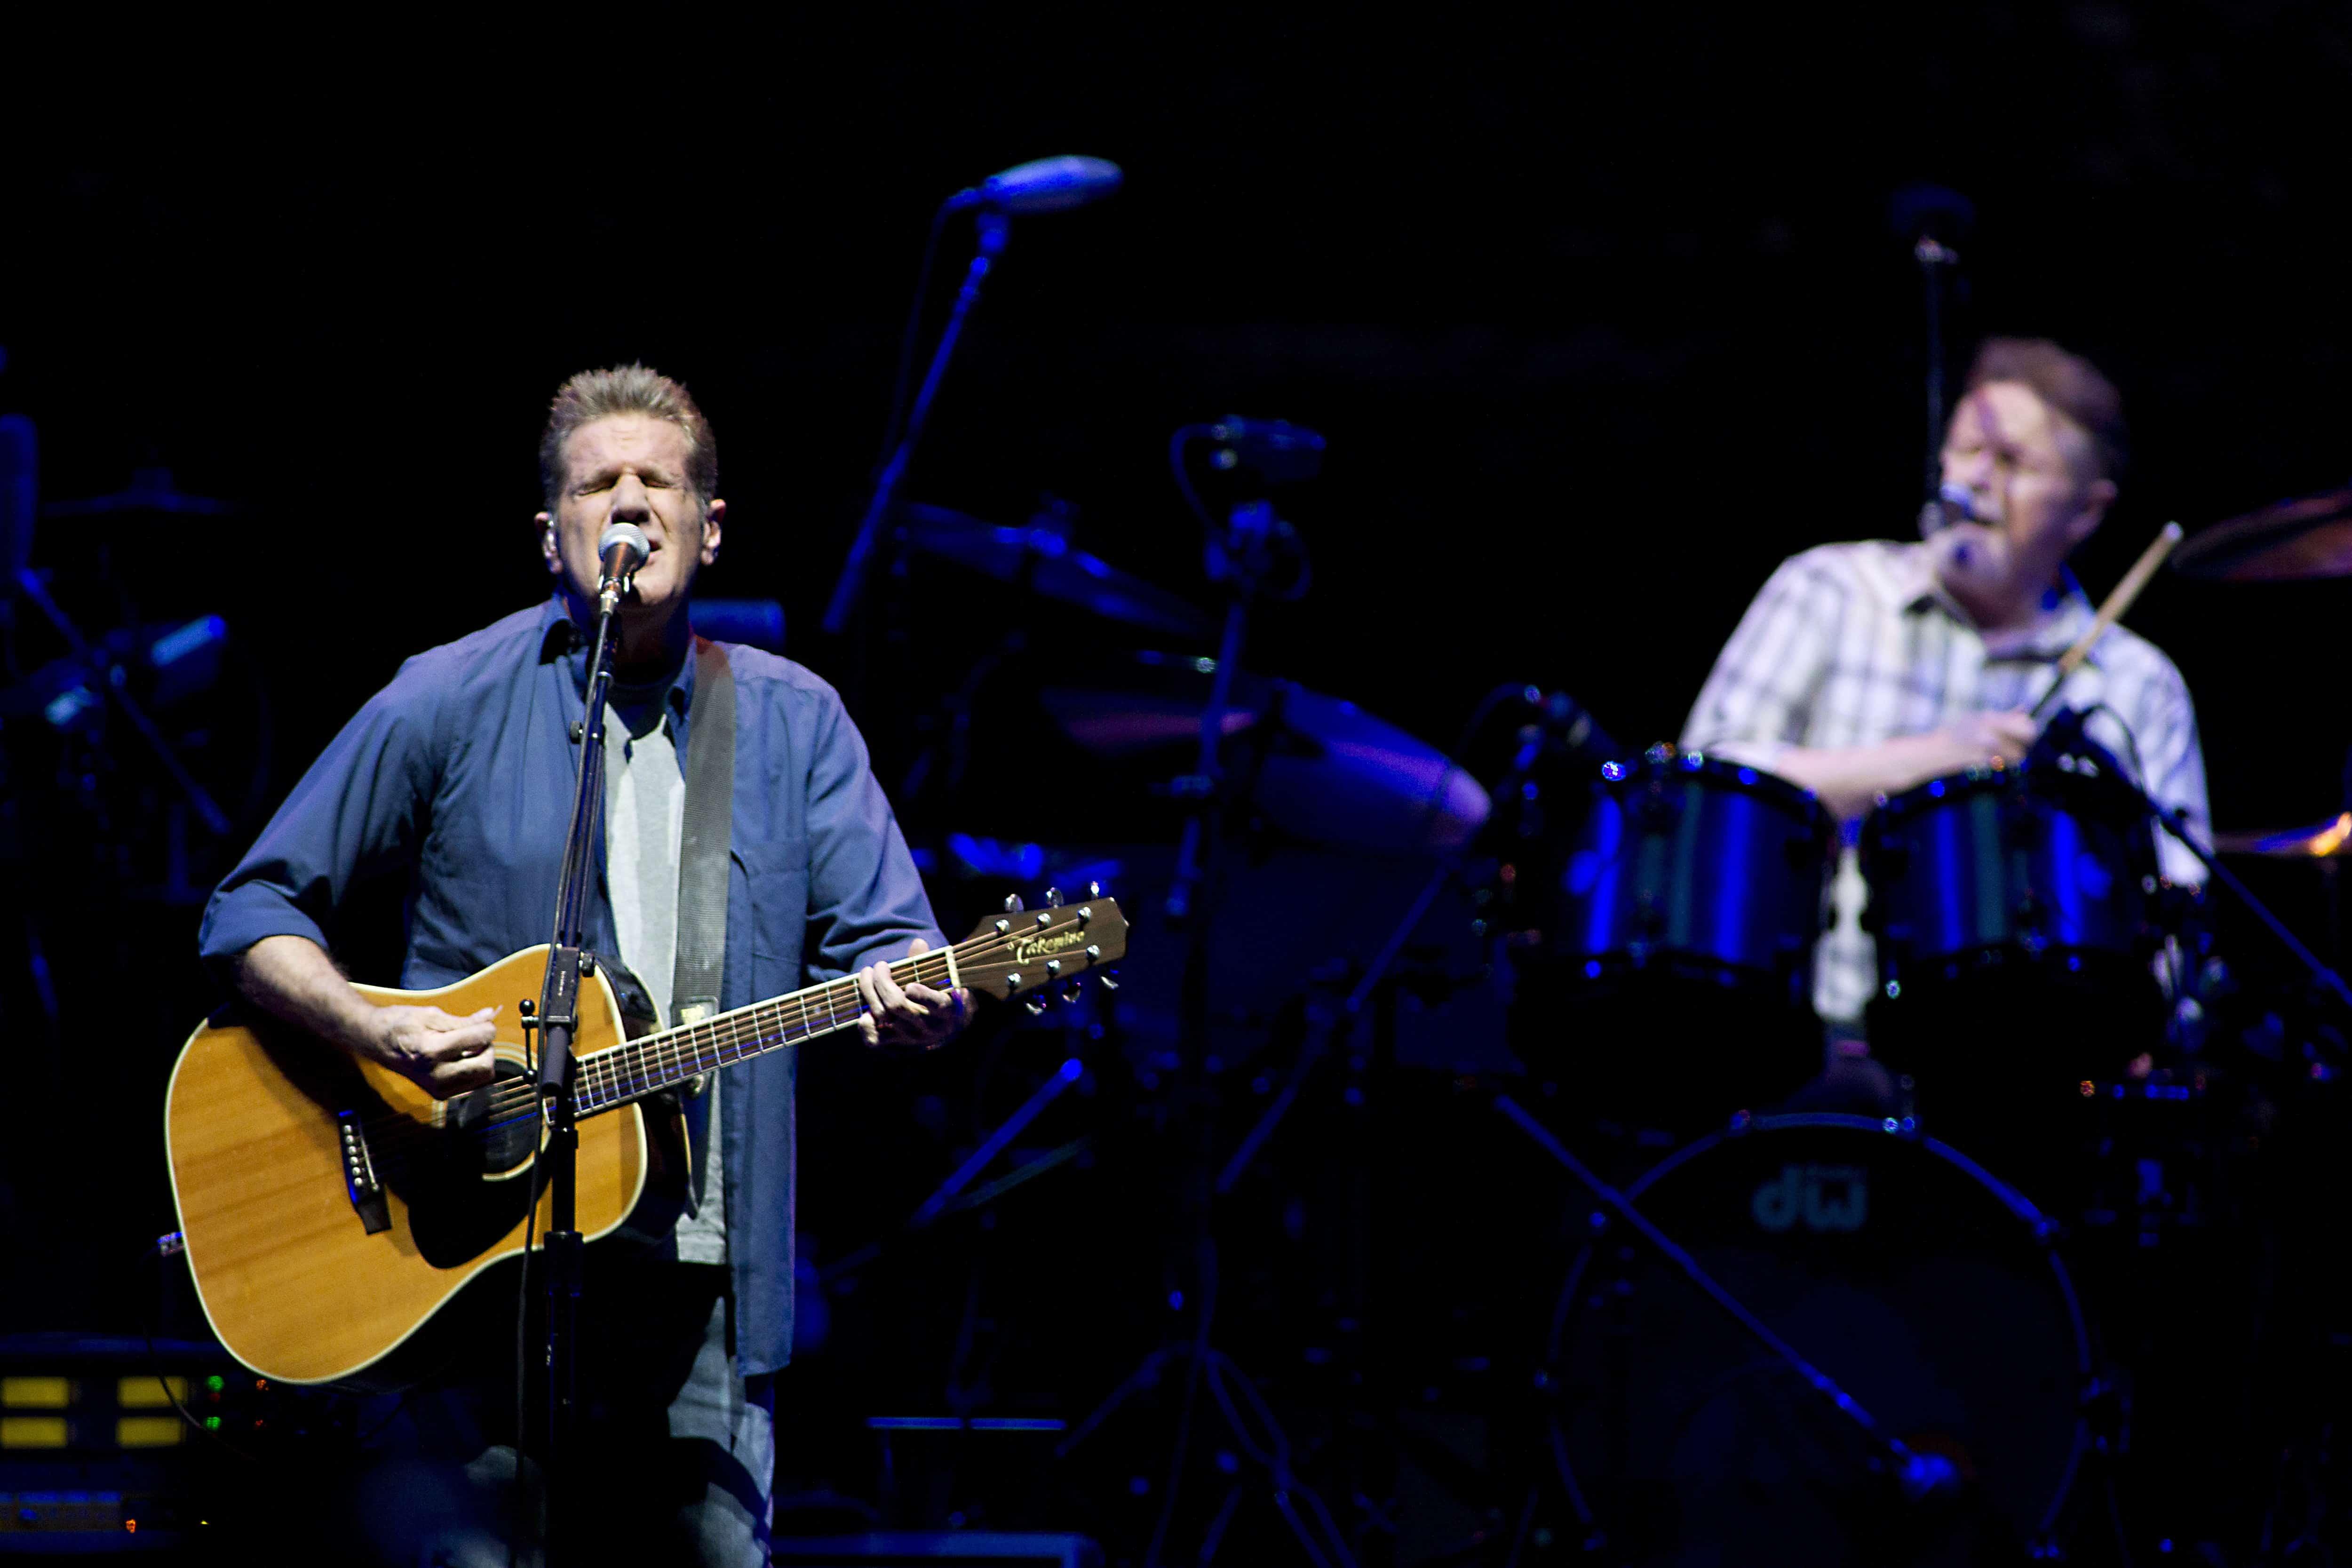 Glenn Frey of the Eagles in 2014